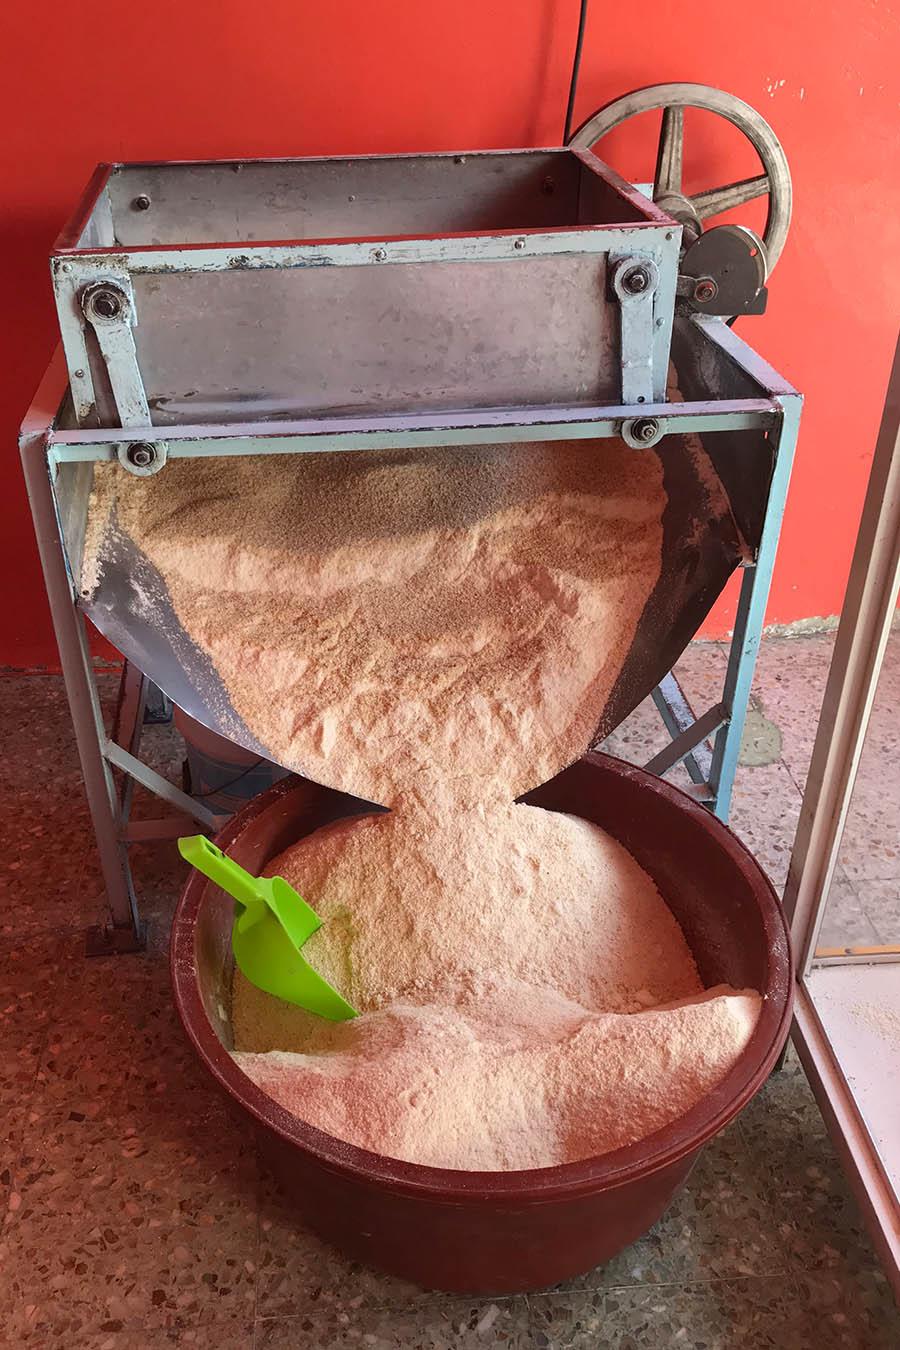 harina de maiz harina natural corn flour harina de maiz nixtamalizado harina fresca harina para tamal